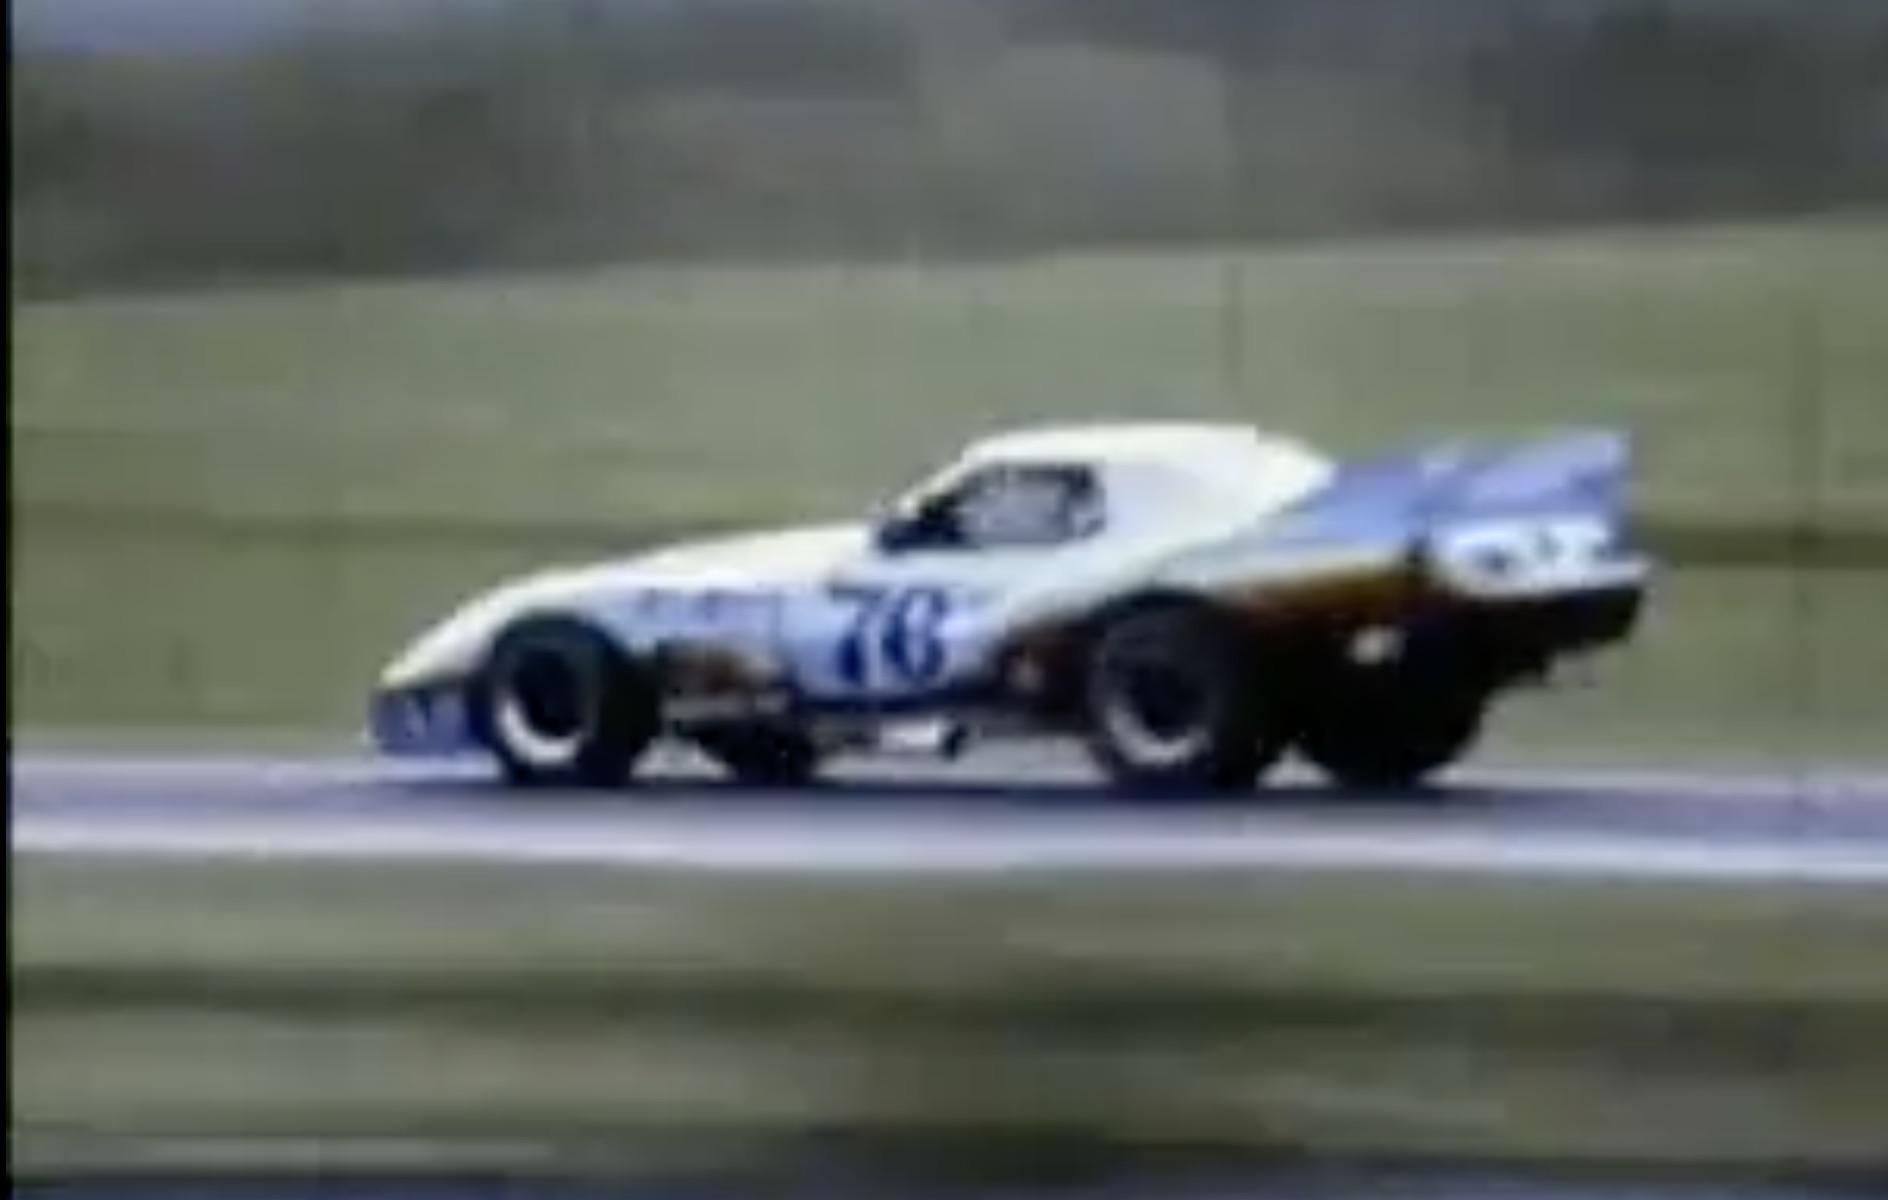 Vintage Footage: SCCA Trans Am Racing At Road America In 1977!